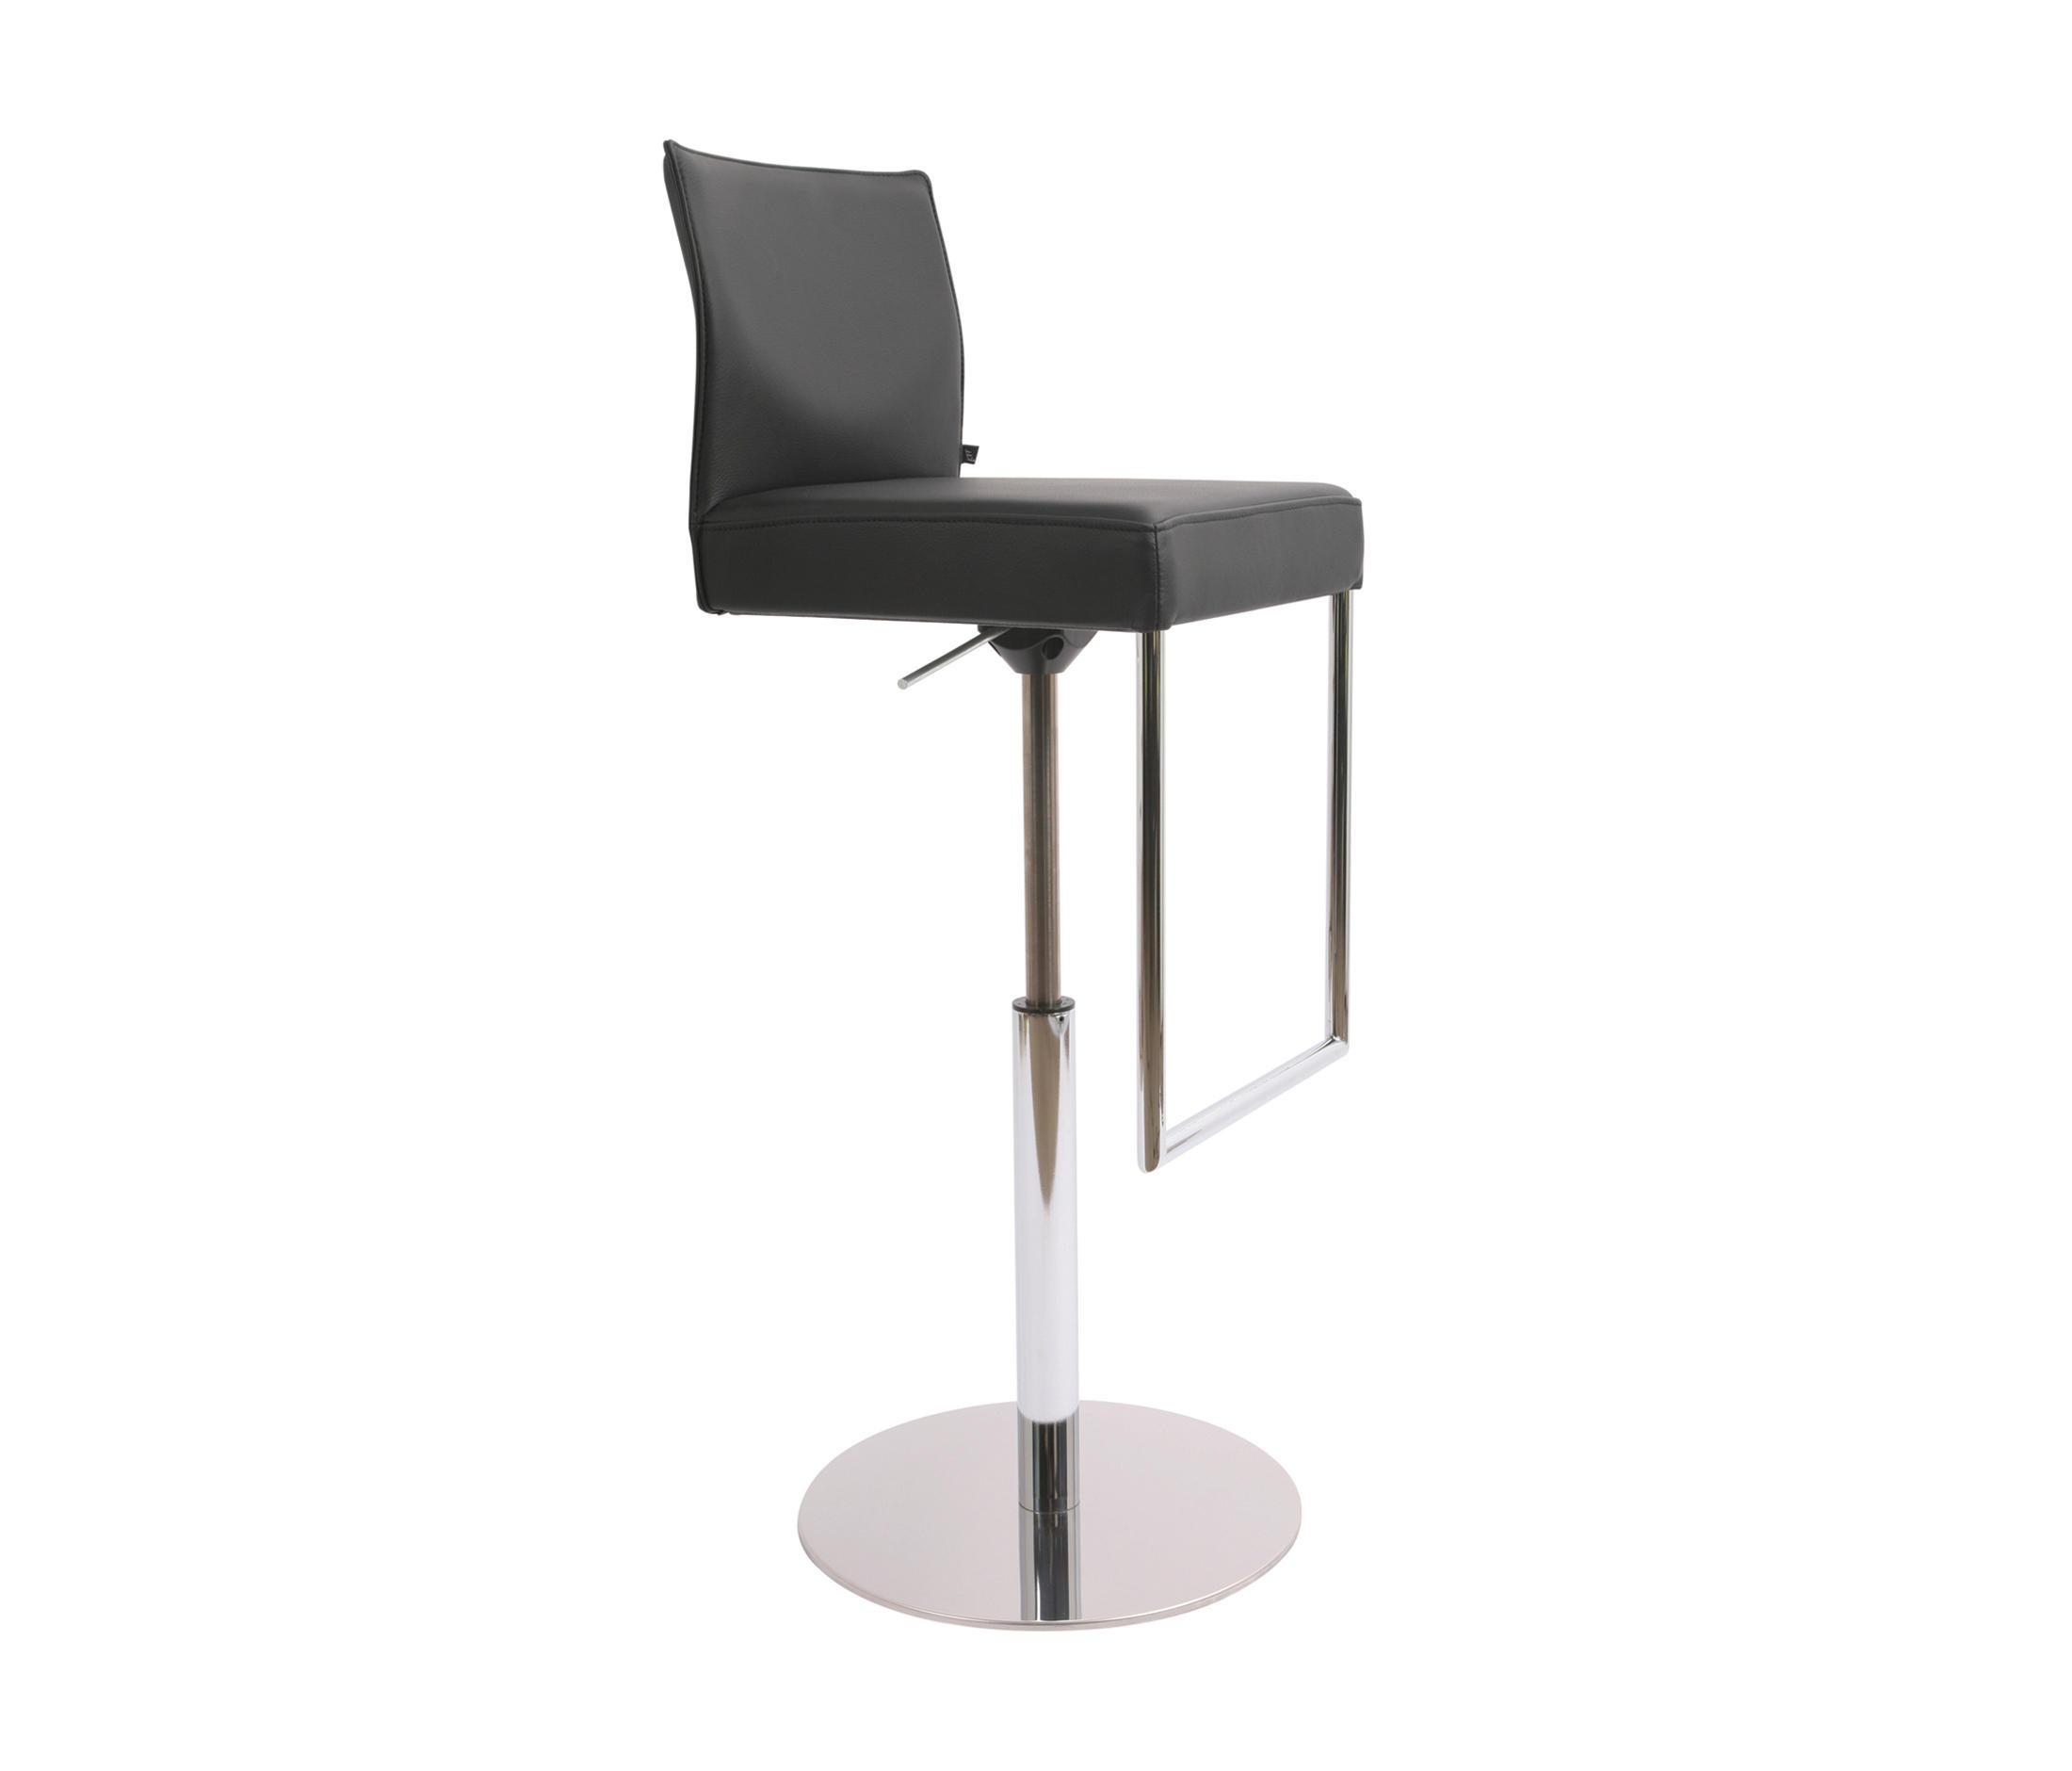 glooh barhocker polster barhocker von kff architonic. Black Bedroom Furniture Sets. Home Design Ideas